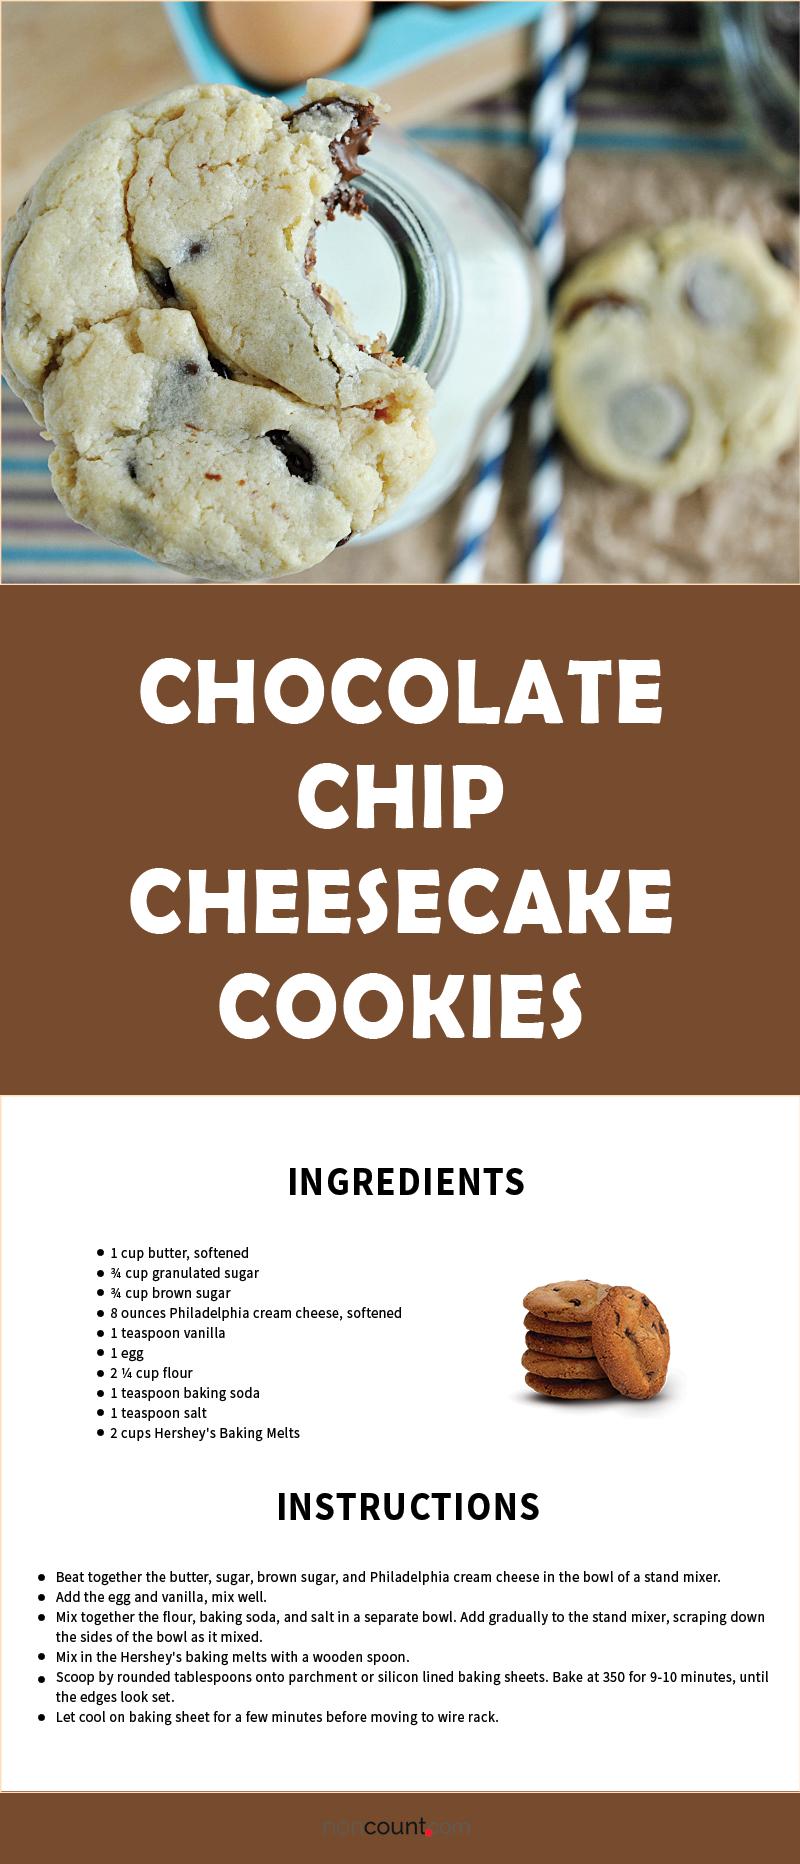 Chocolate Chip Cheesecake Cookies Recipe Image